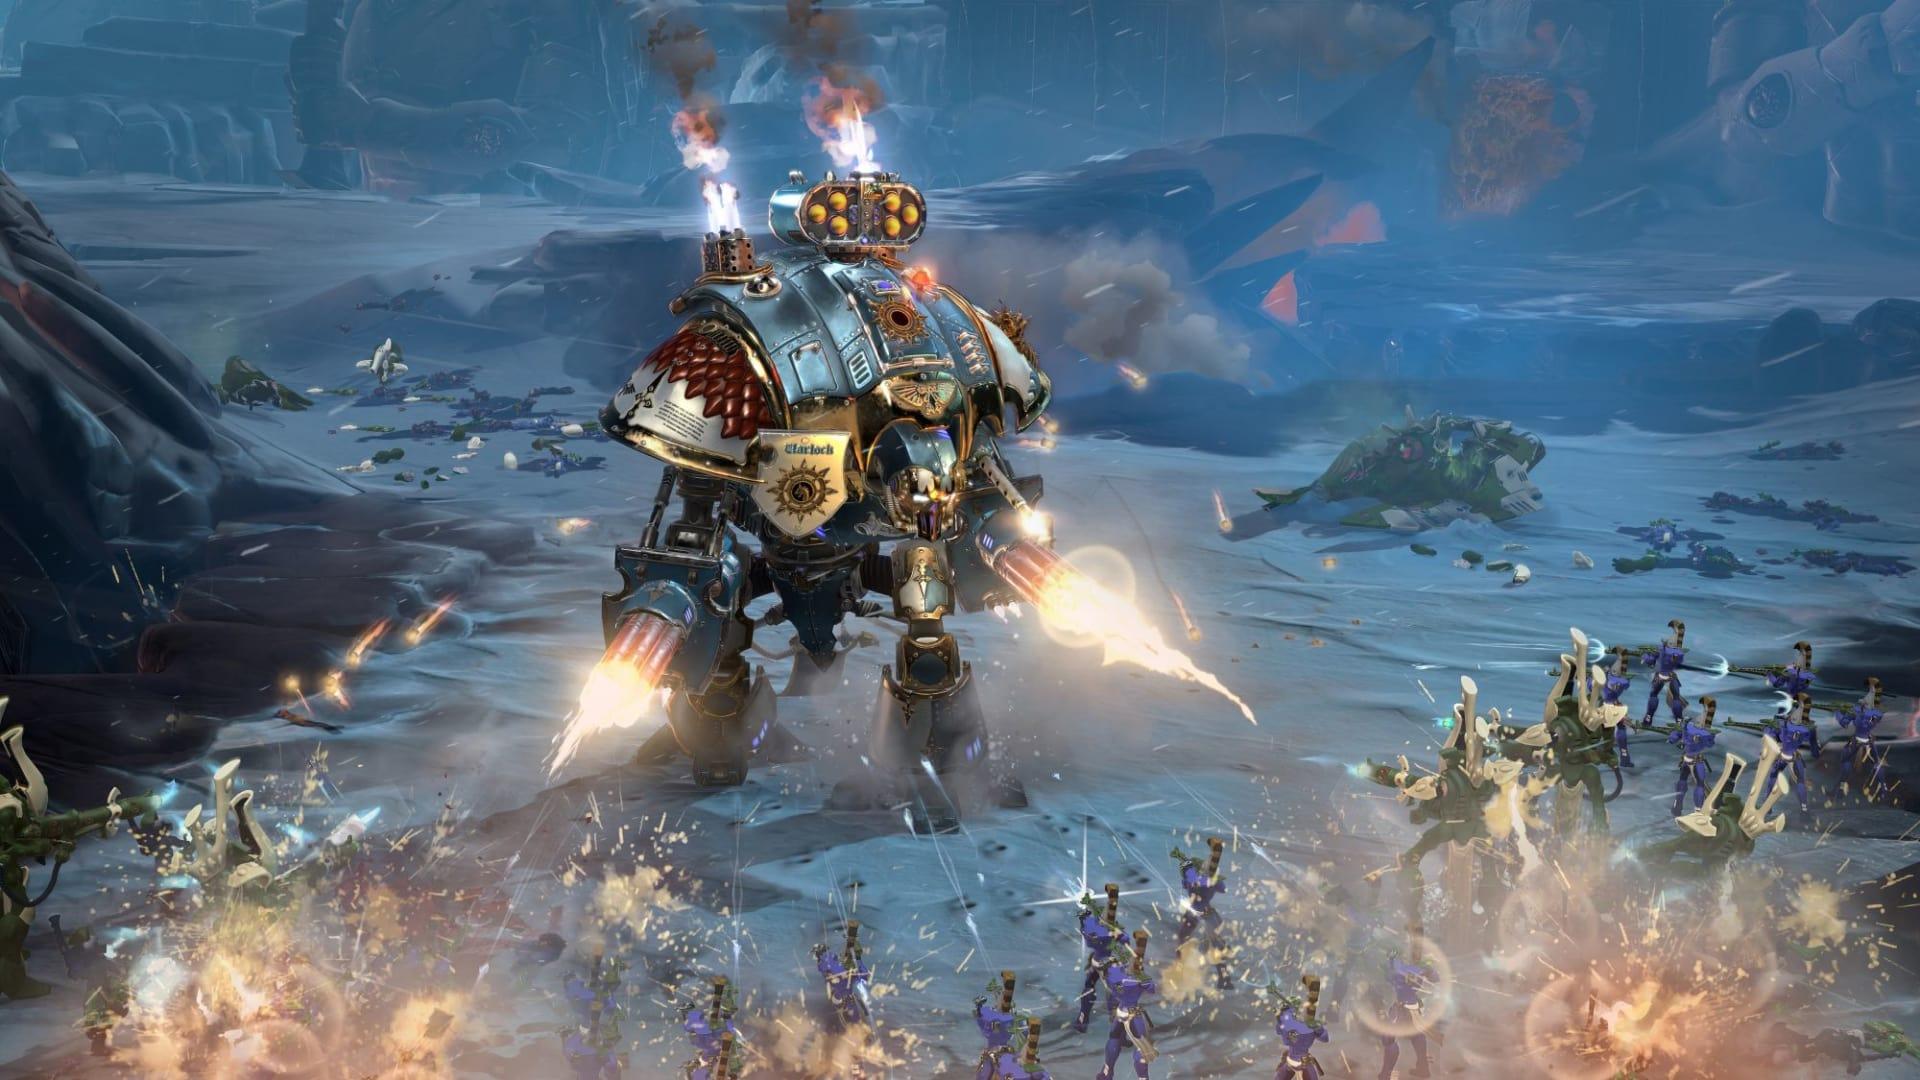 Anmäl dig till den öppna Dawn of War 3-betan